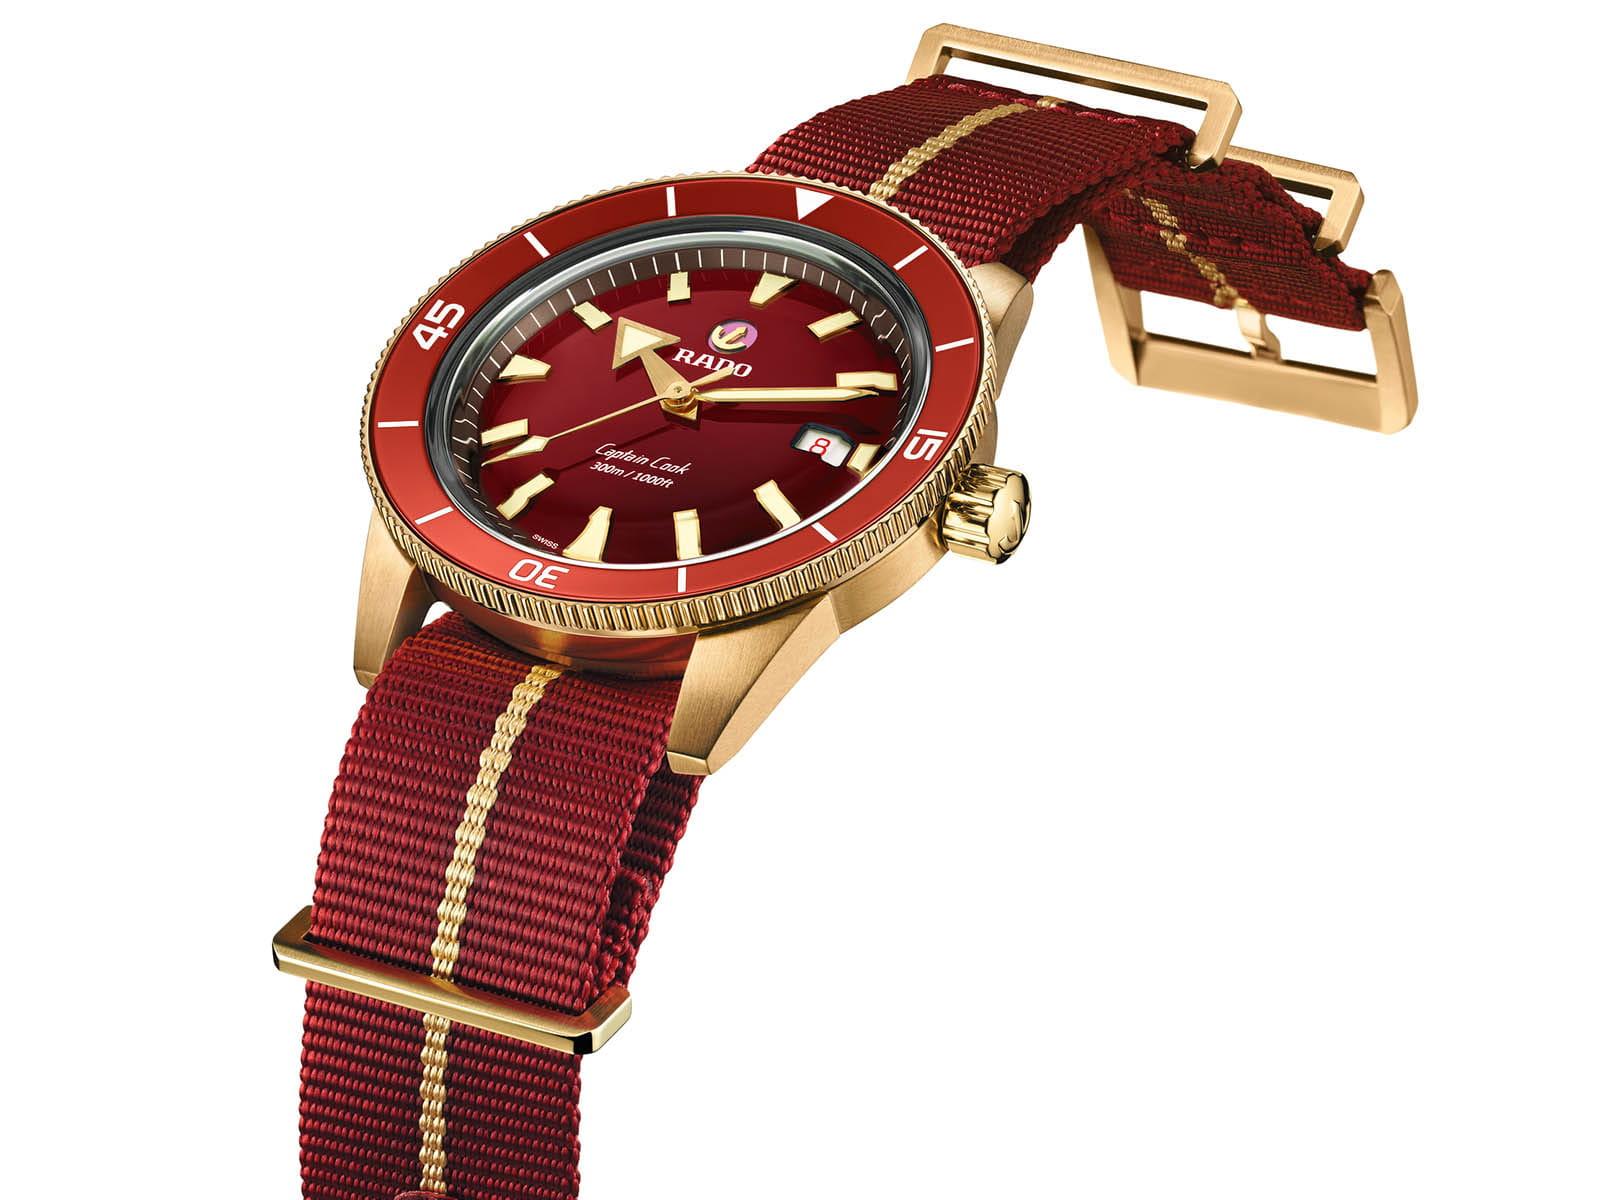 01-763-0504-3-540-rado-captain-cook-bronze-burgundy-dial-3.jpg